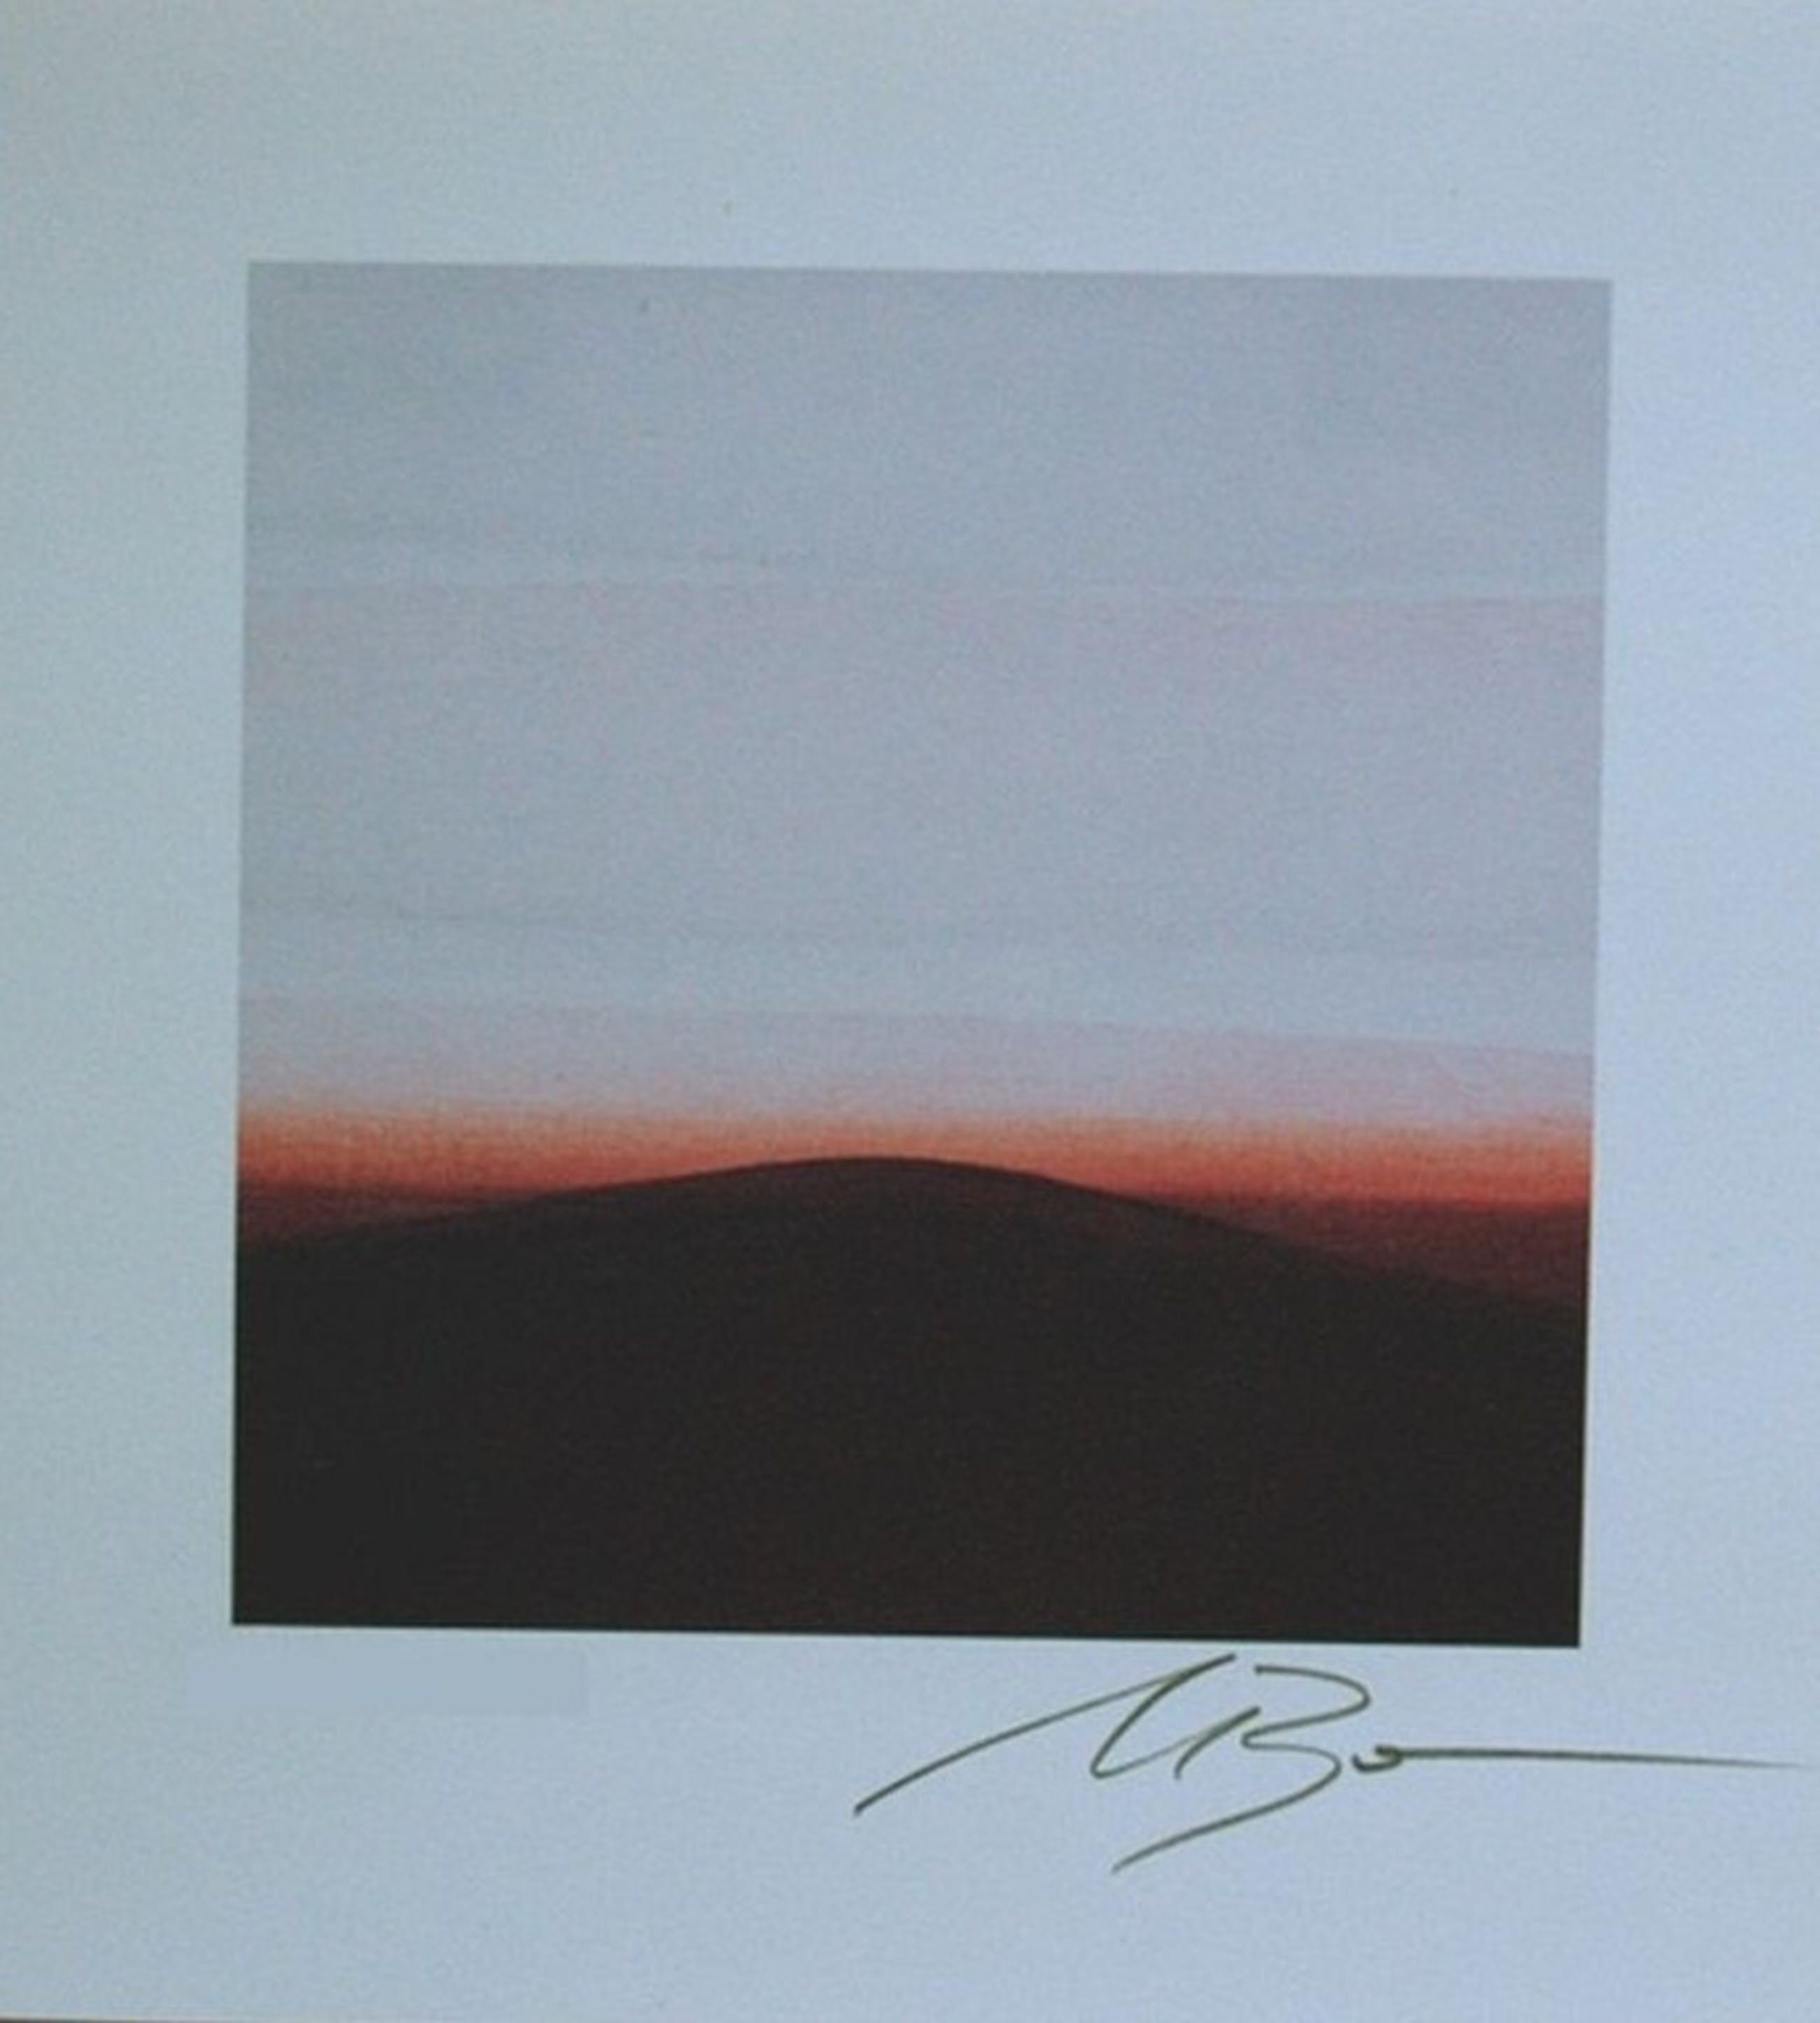 Manfred Bockelmann: Lithografie, Avond kopen? Bied vanaf 10!